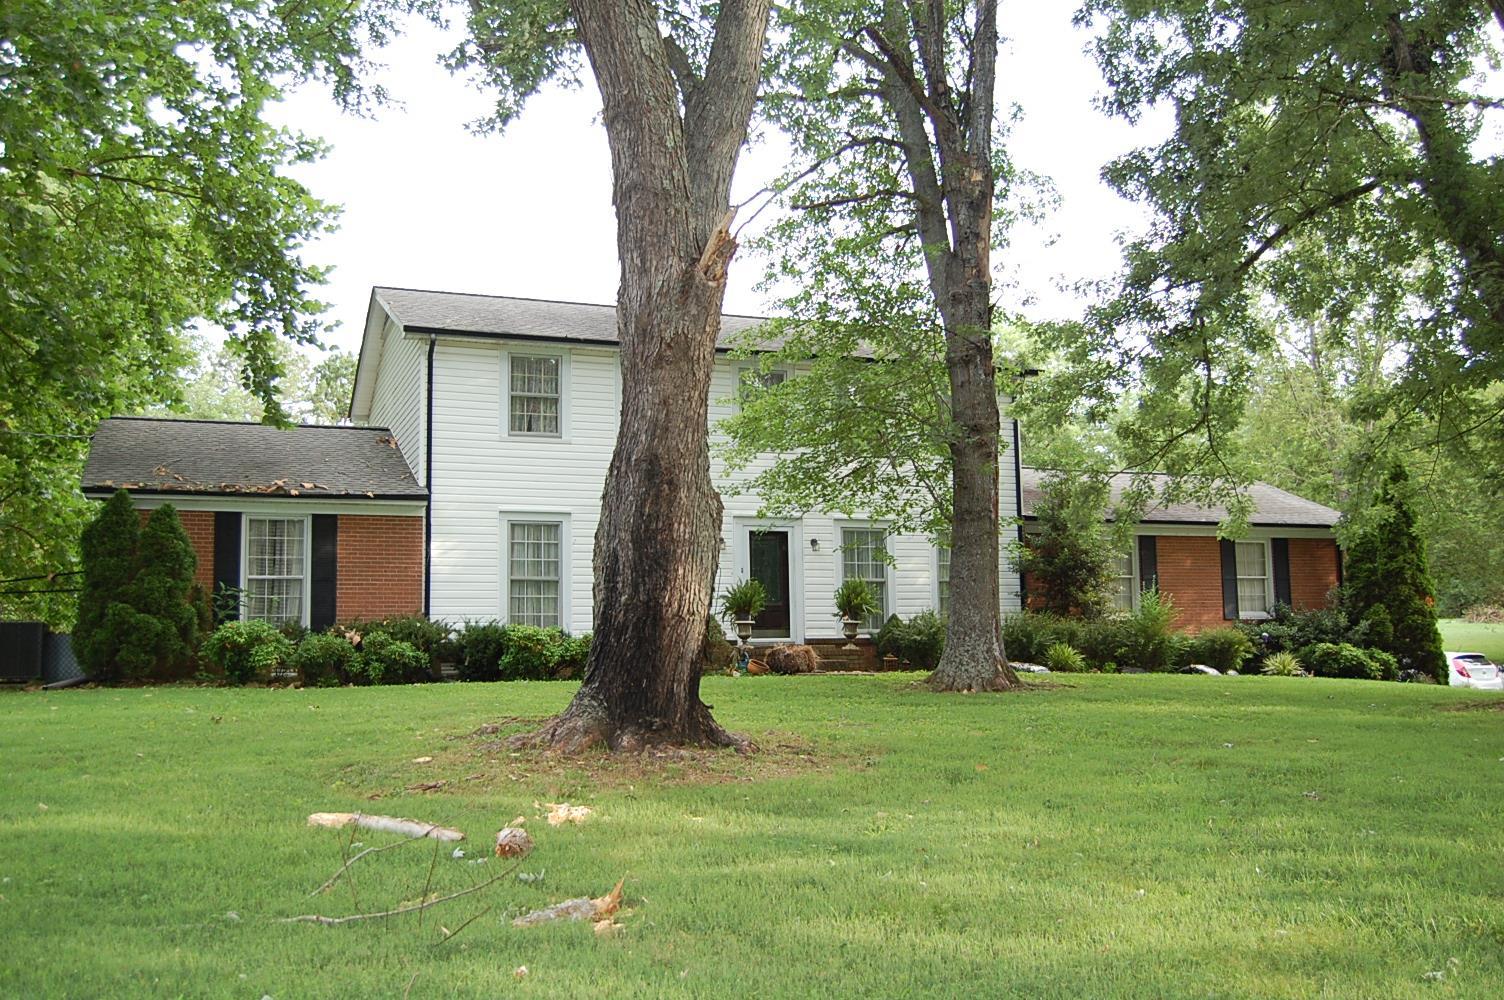 2207 Creekside Ln, Franklin, TN 37064